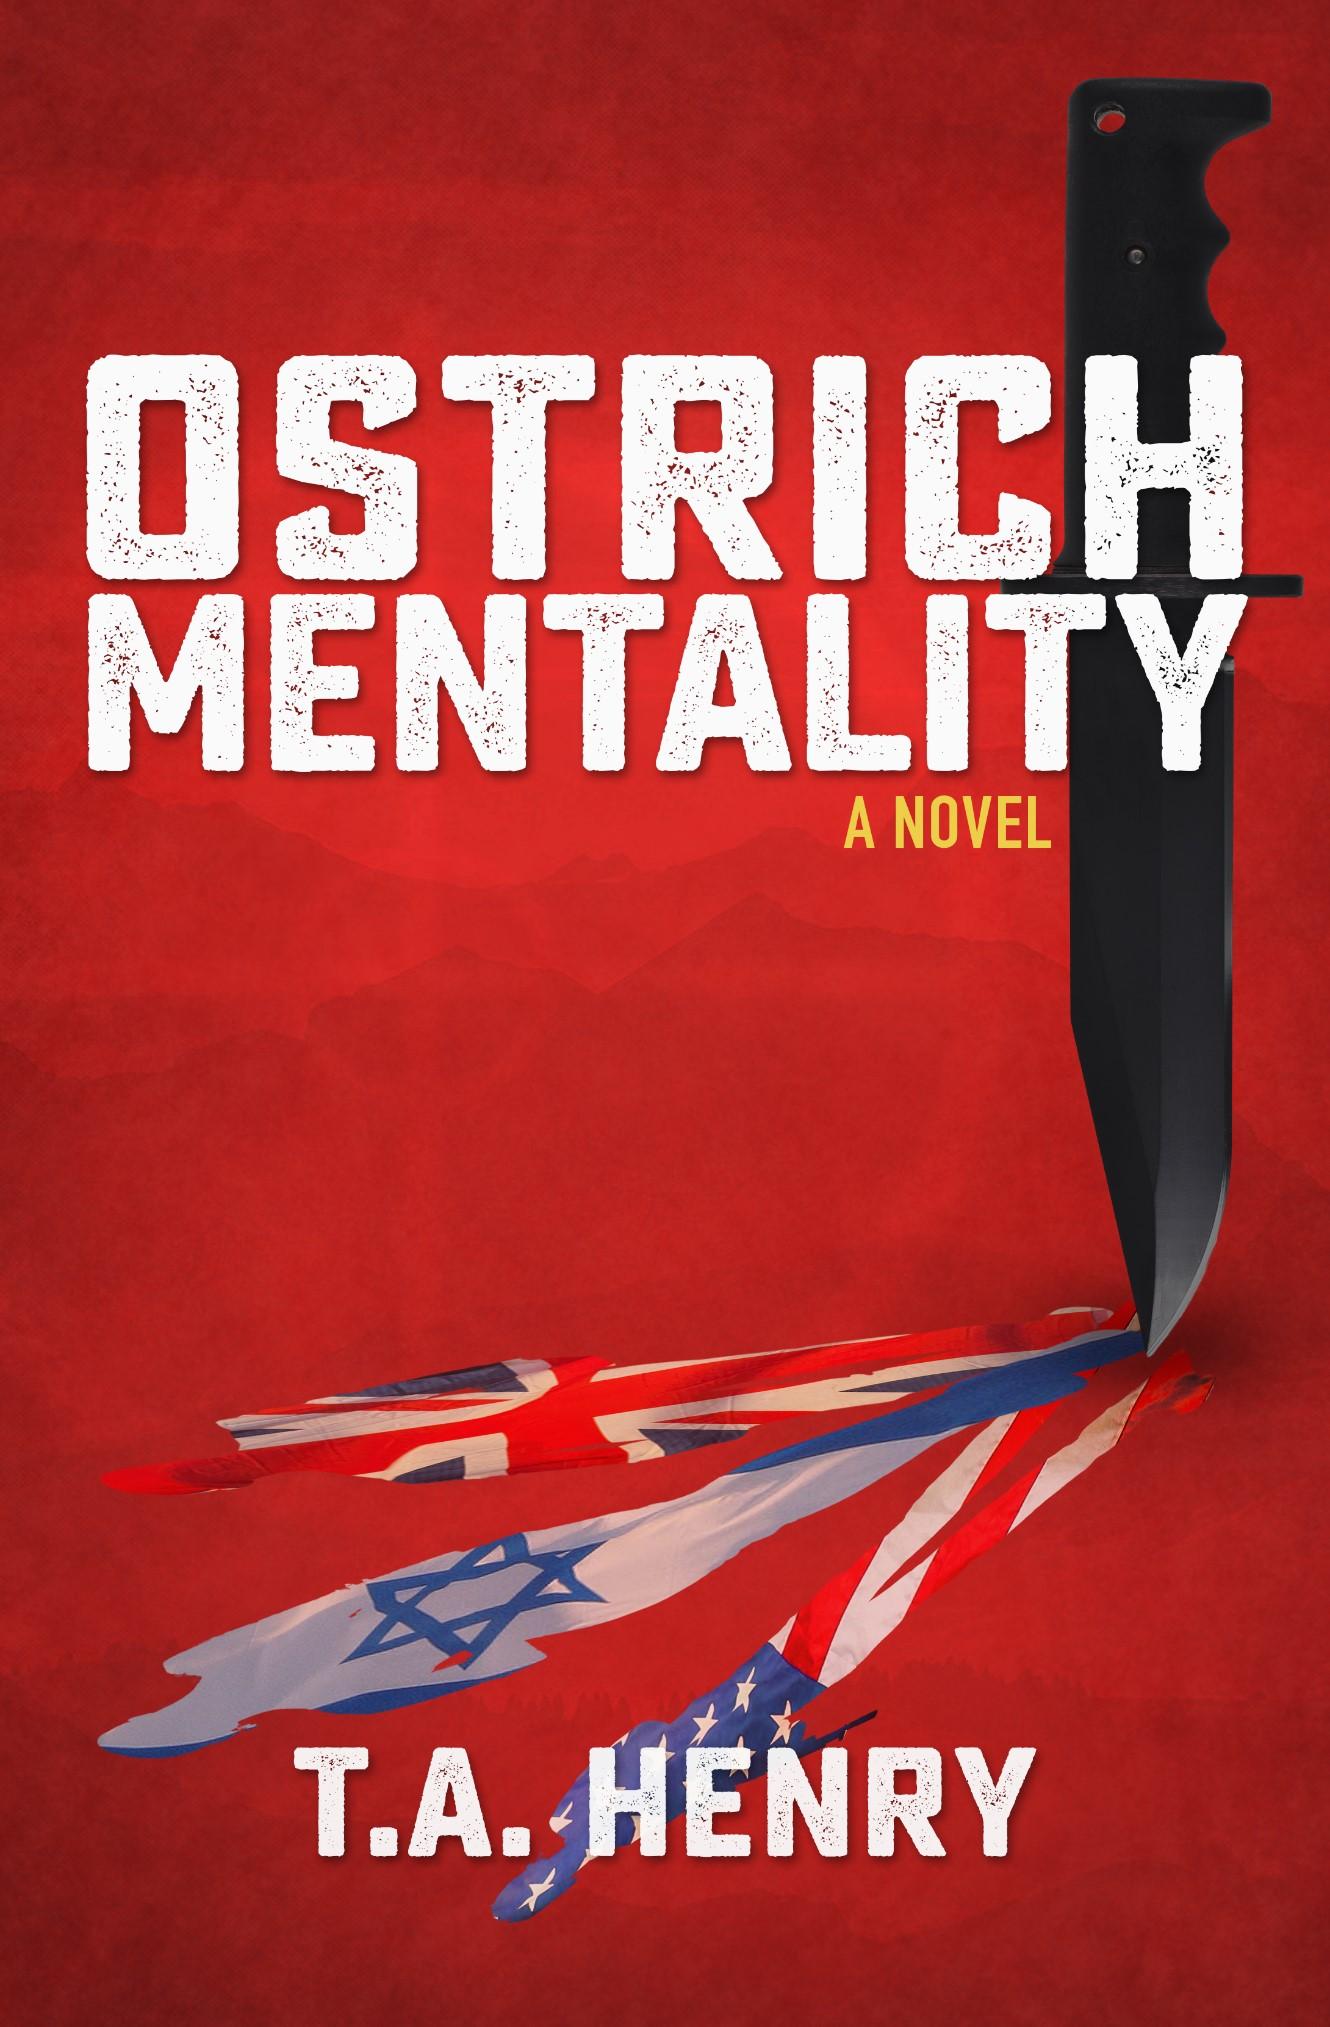 #BadMoonRising: Ostrich Mentality by T.A. Henry #thriller #alternativehistory #TuesdayBookBlog